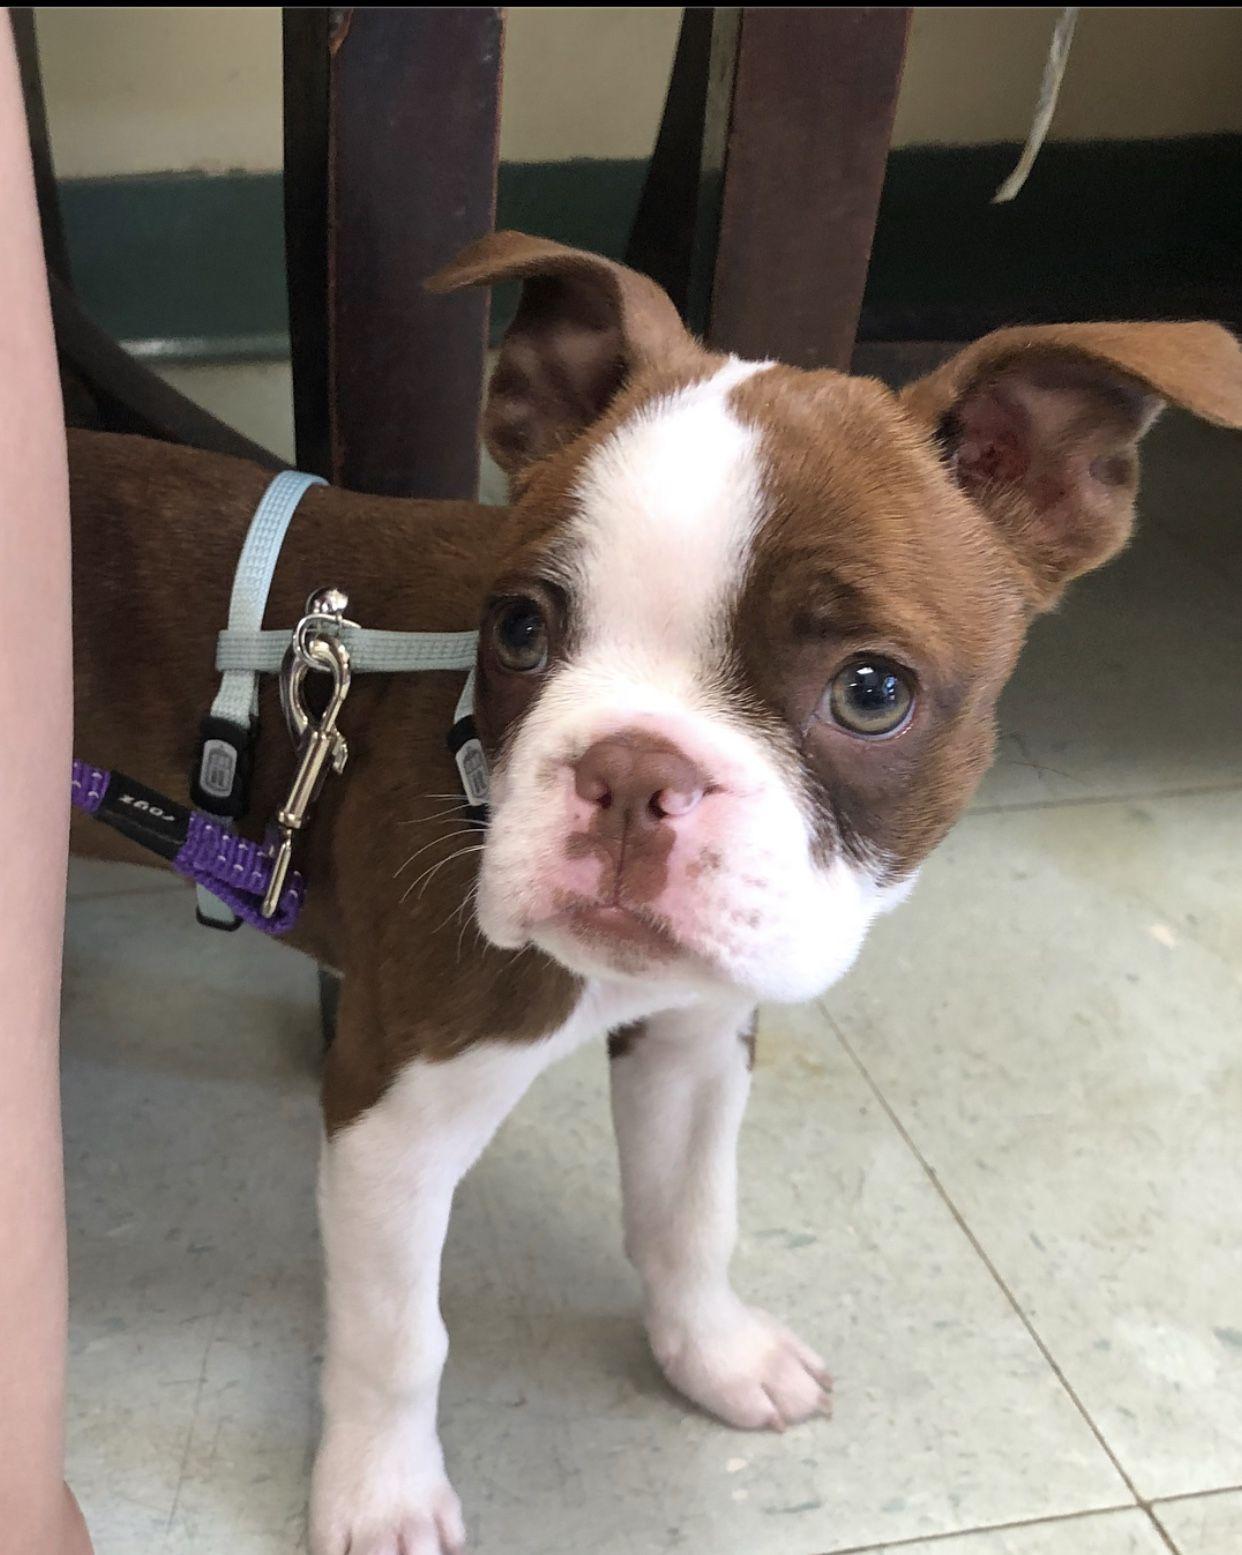 Available Puppies Miniature Home Raised Boston Terriers For Sale In 2020 Boston Terrier For Sale Boston Terrier Miniature Boston Terrier